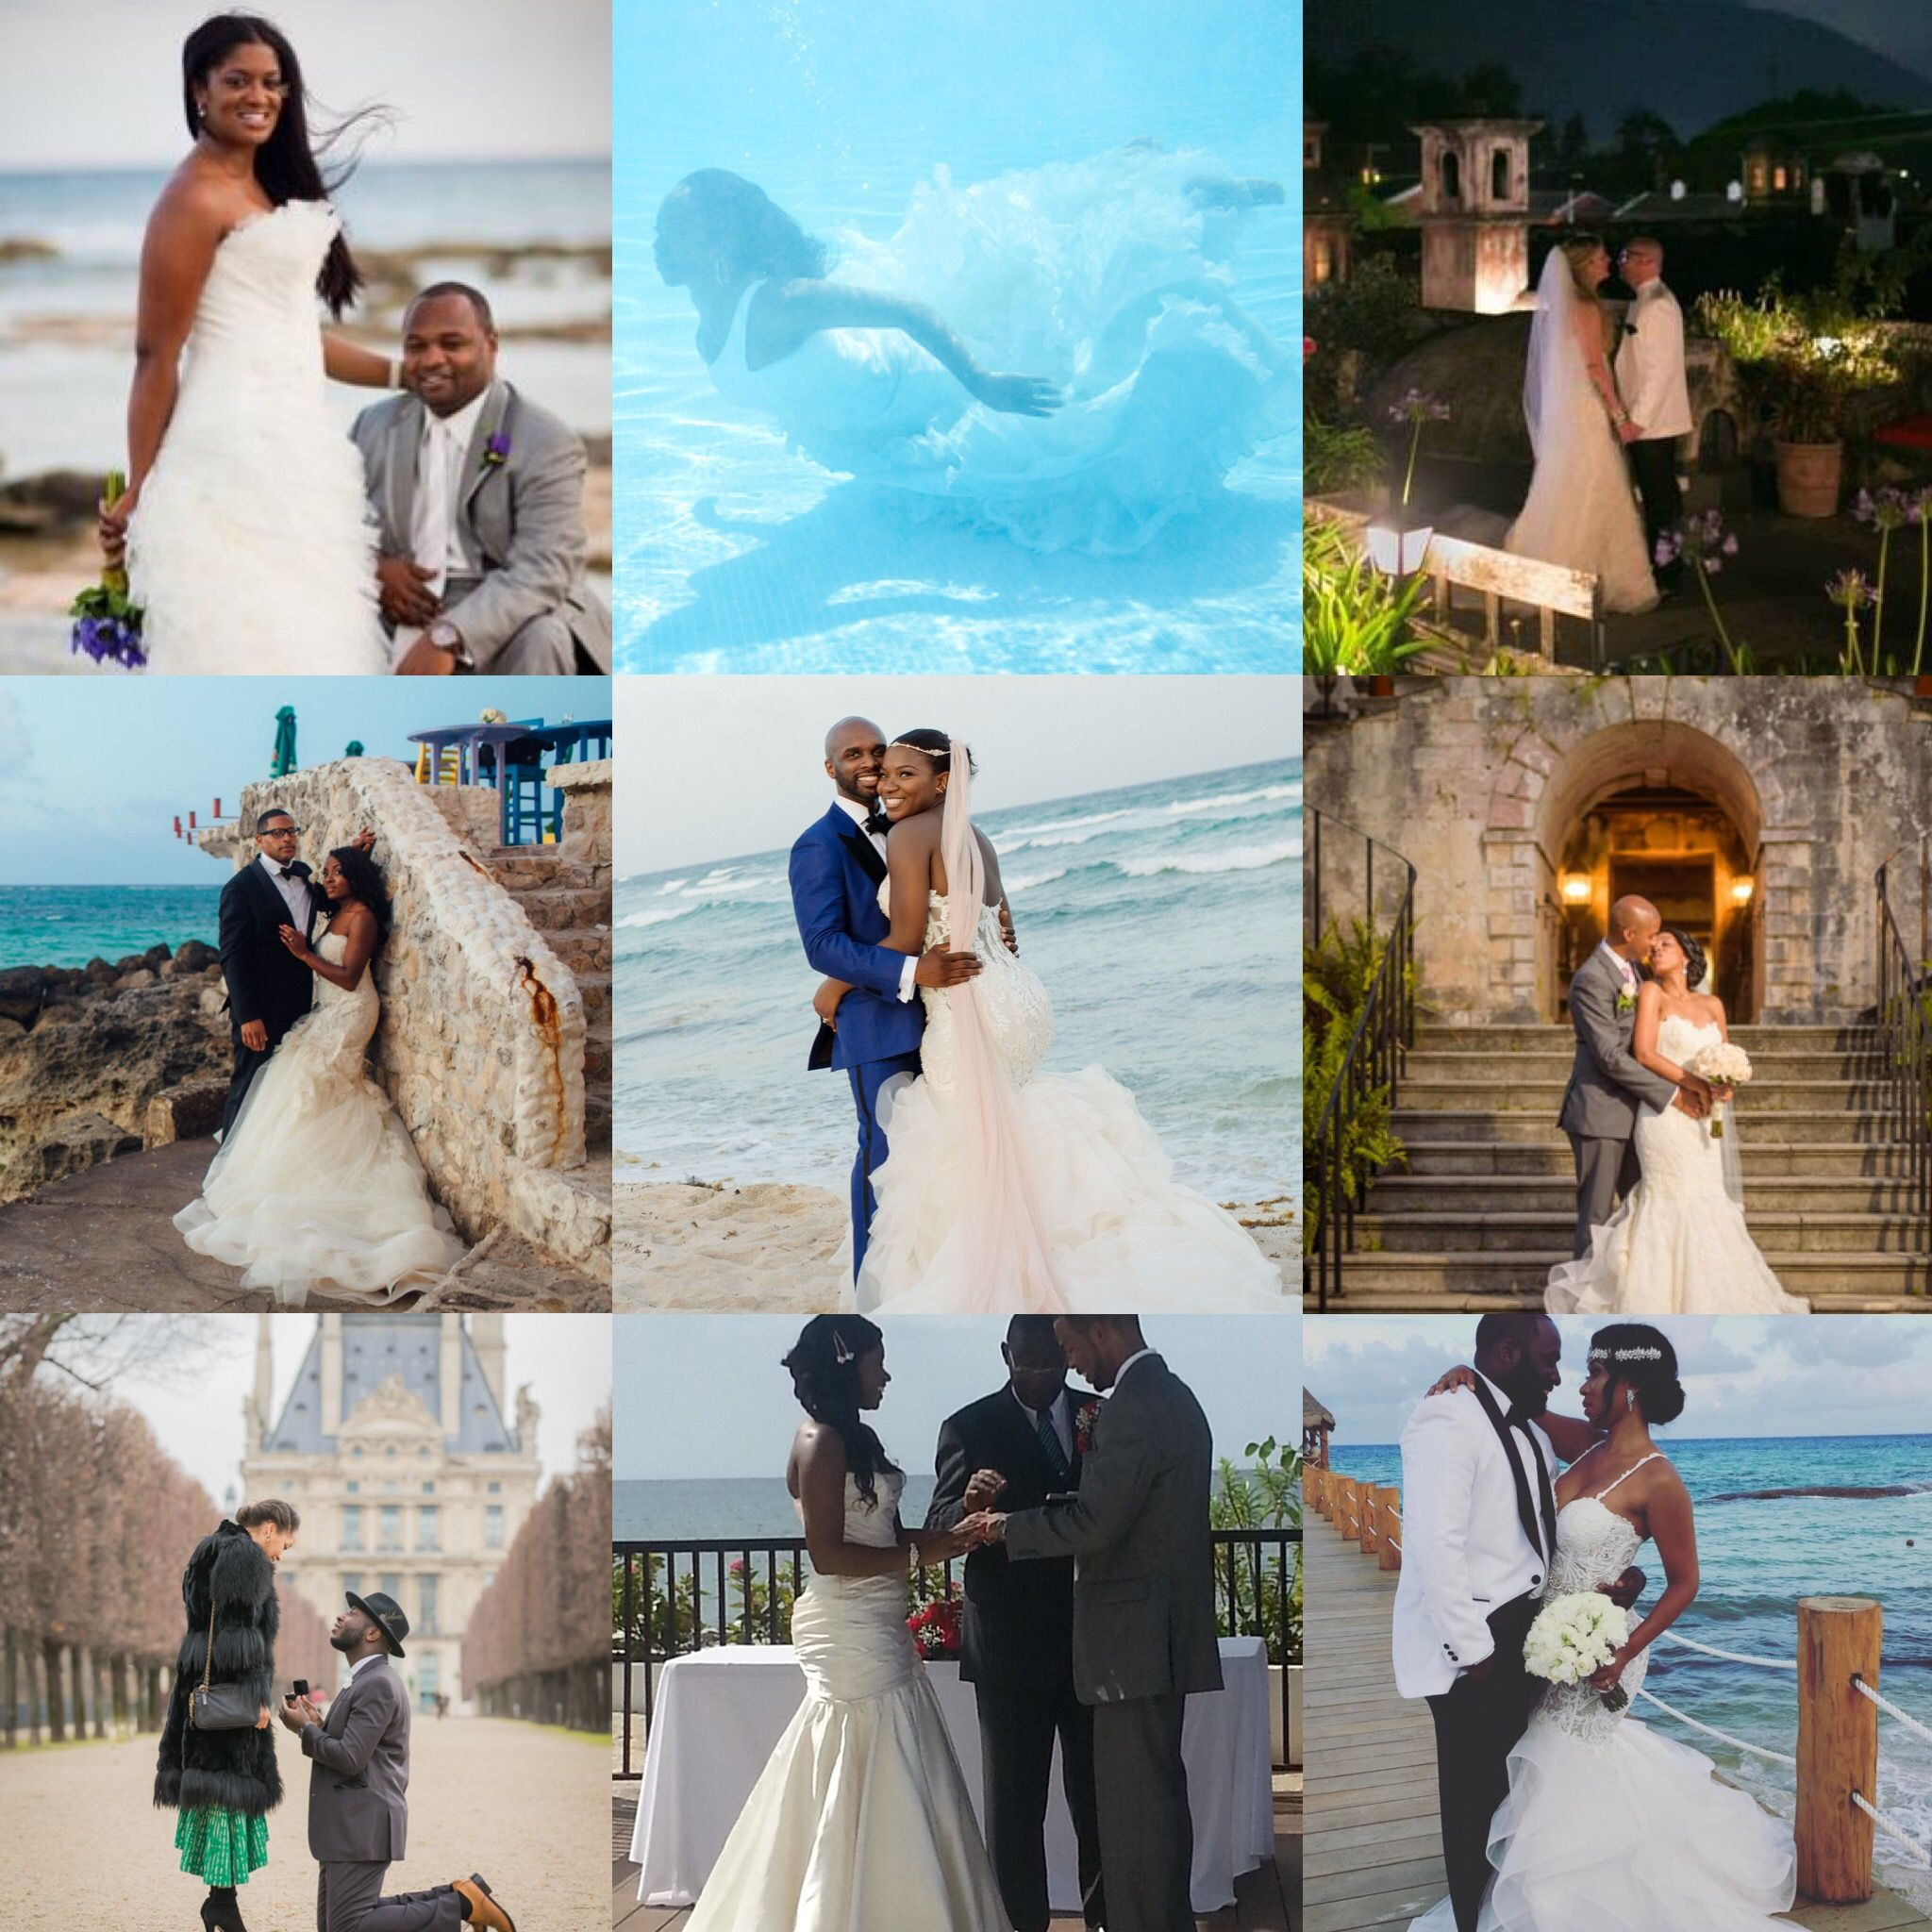 bridefriends-guide-to-destination-weddings-podcast-blackdesti-black-destination-bride-best-of-2017-episode-021.JPG